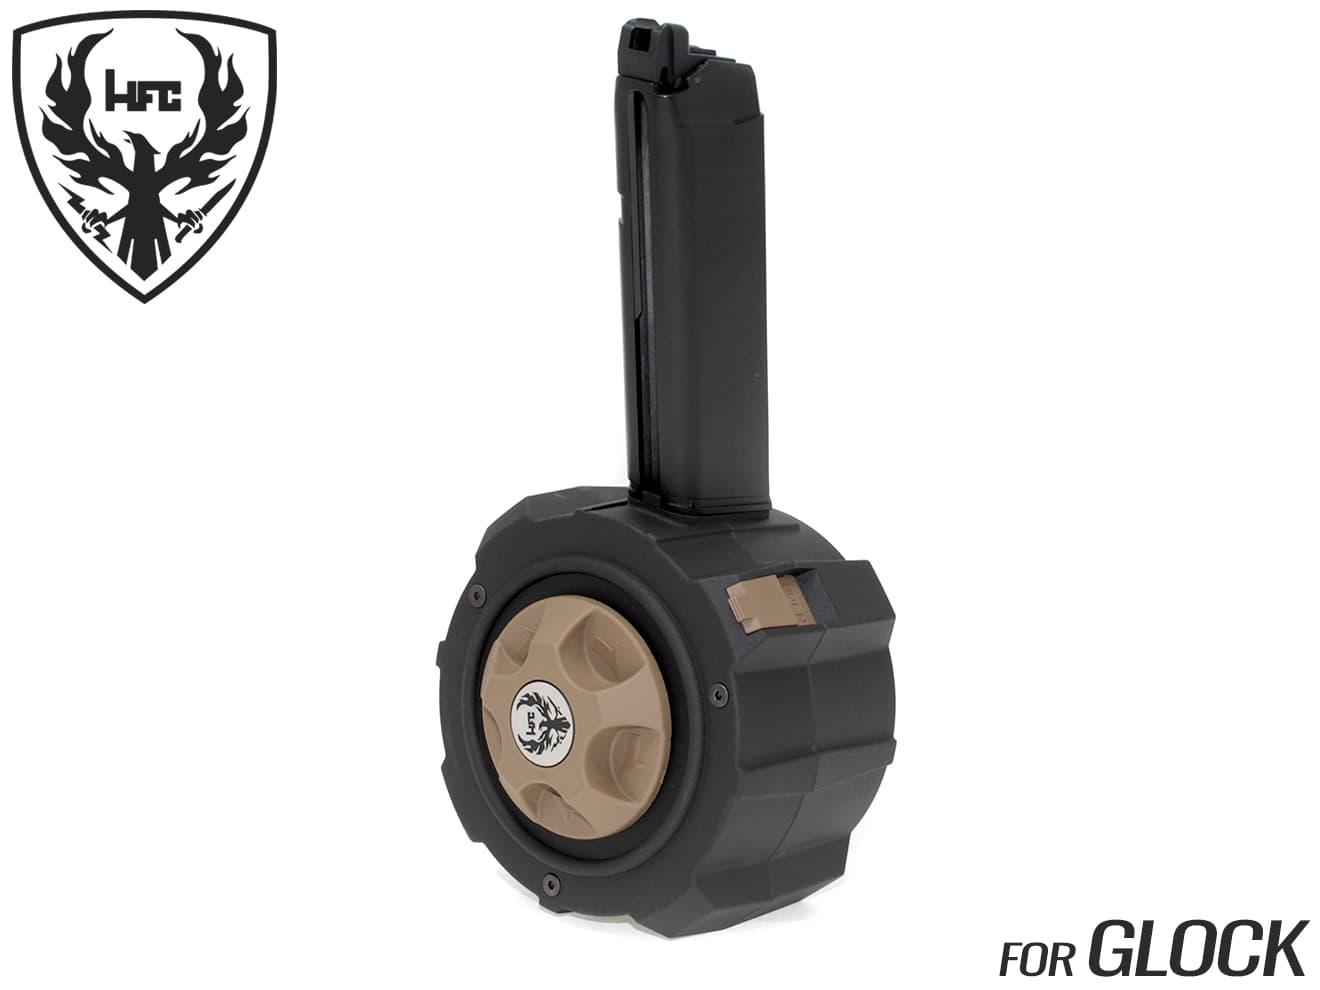 HFC ガスドラムマガジン 145Rds GLOCK用◆BK/DE マルイ ガスブロ グロックシリーズ対応 ゼンマイ式 145発装填 ガス容量超増大 BB弾付属